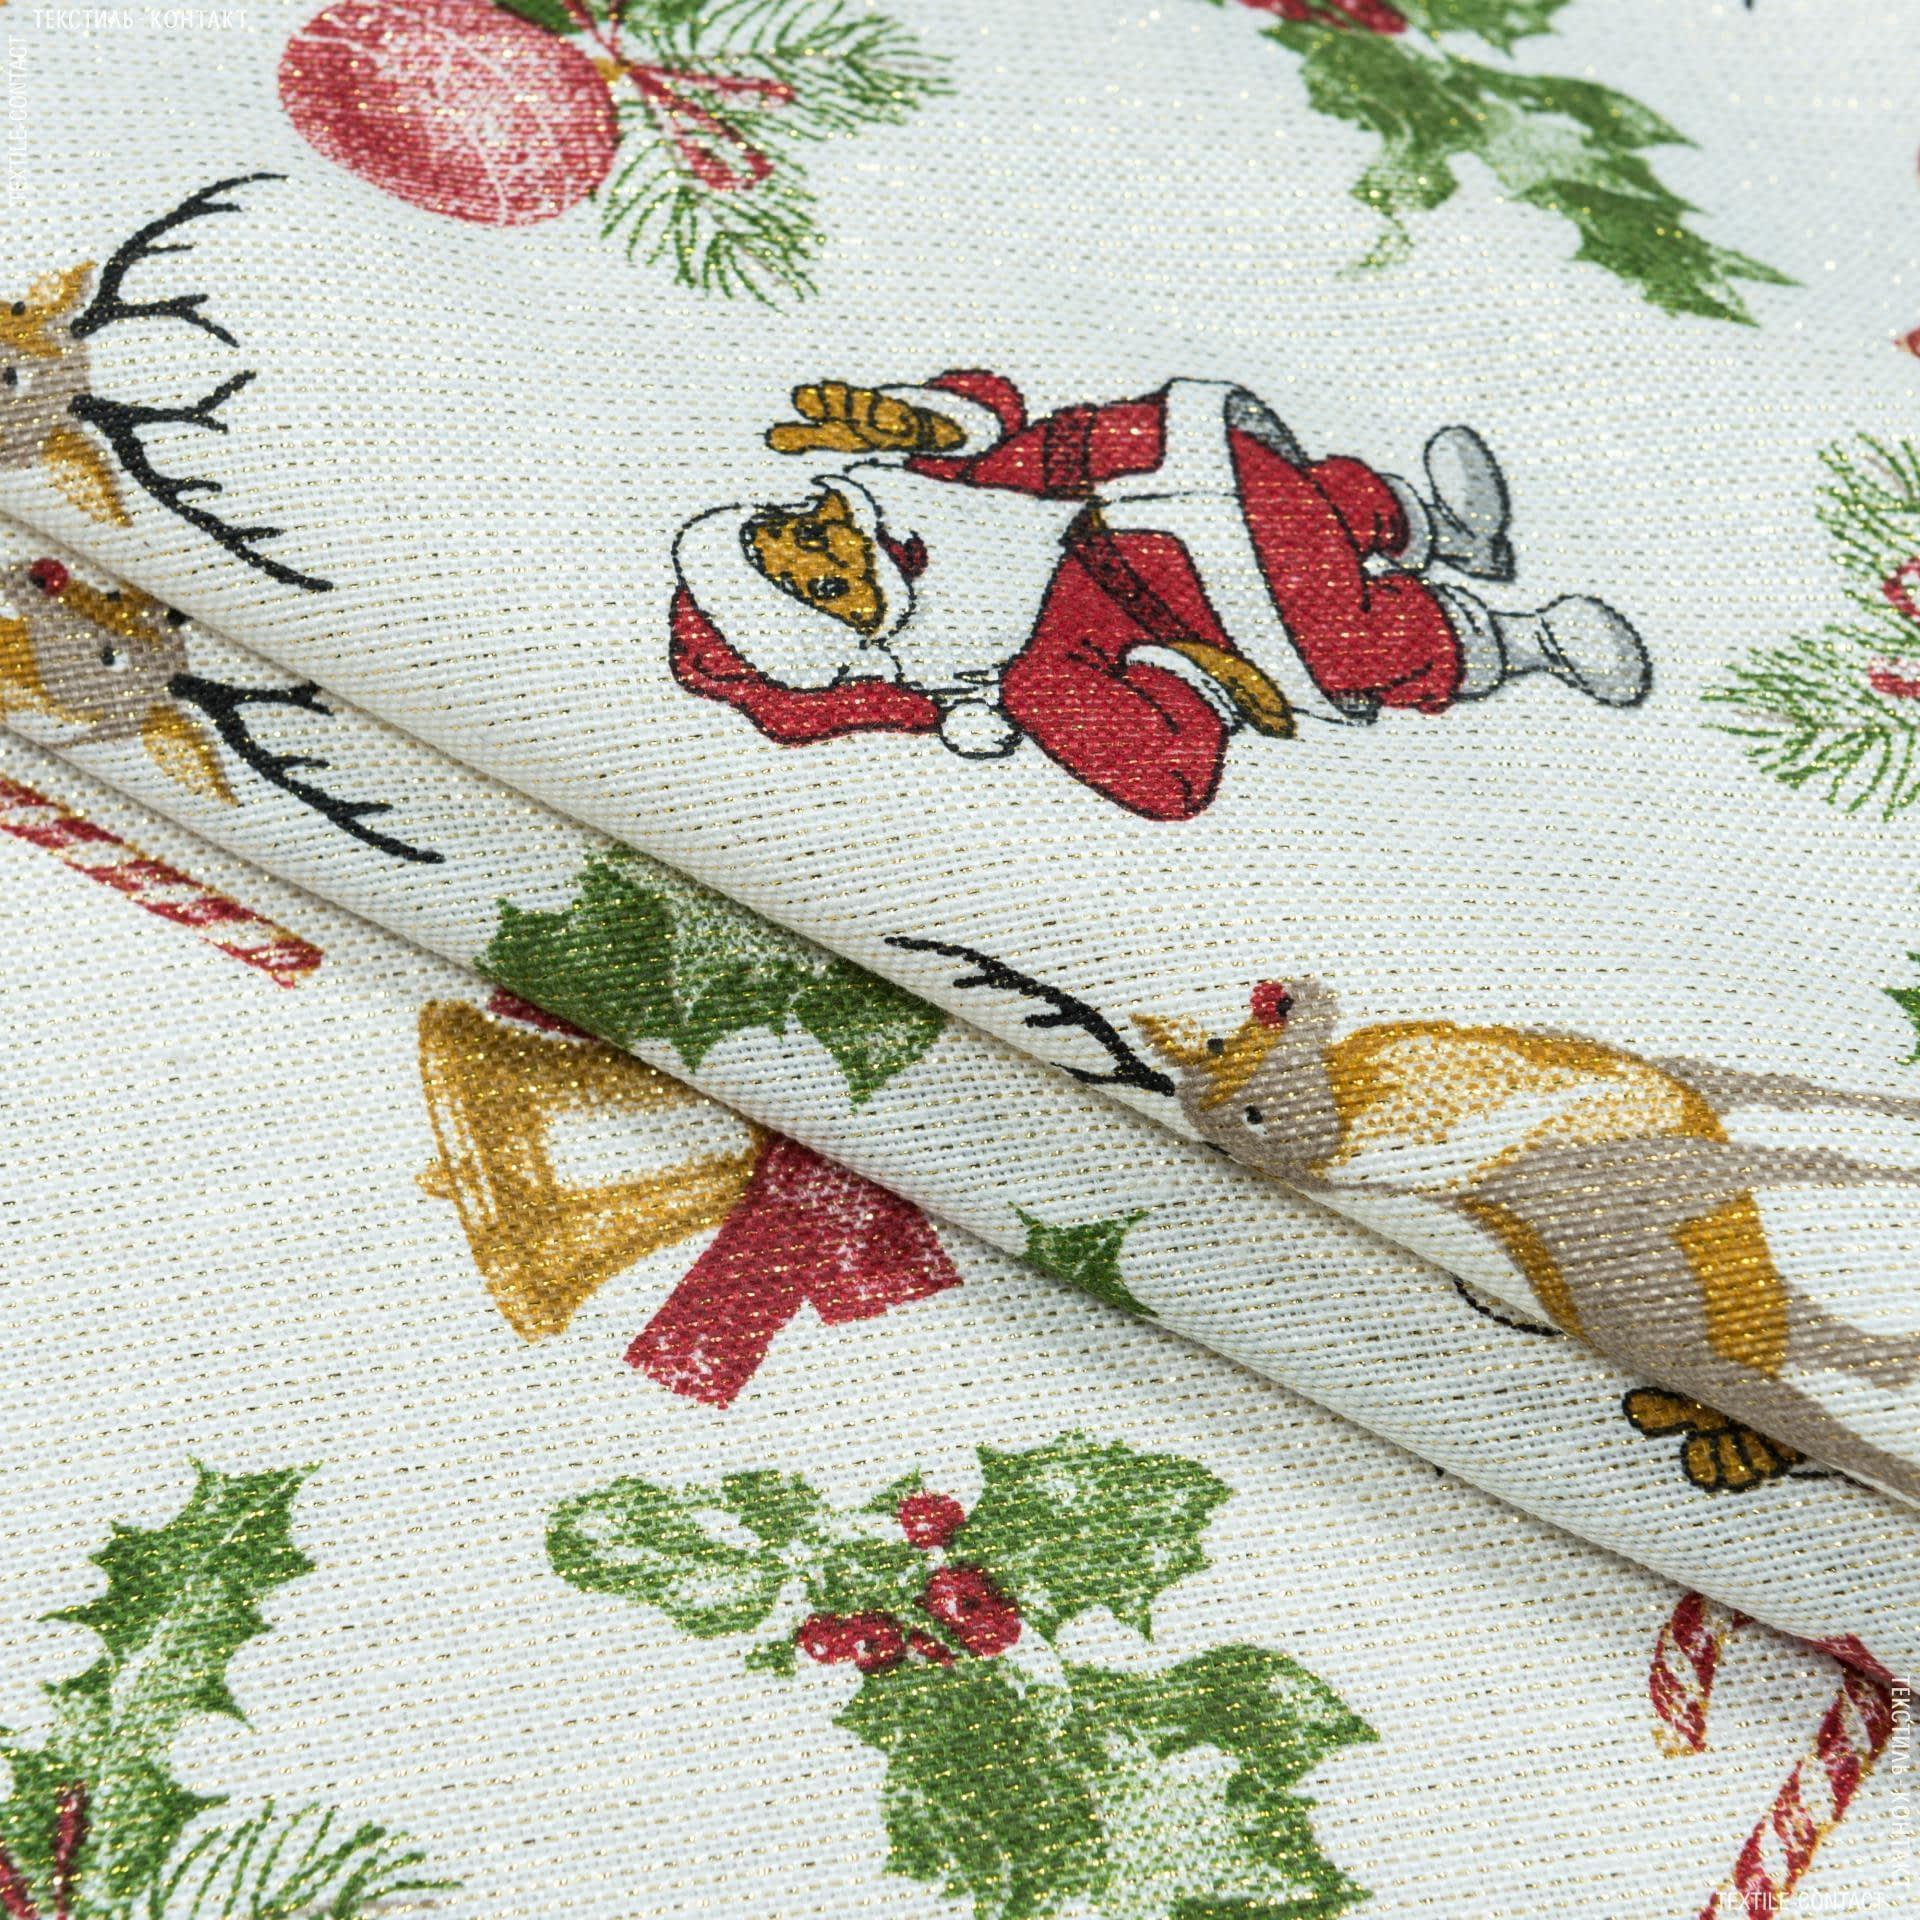 Ткани для декоративных подушек - Декоративная новогодняя ткань санта-клаус люрекс